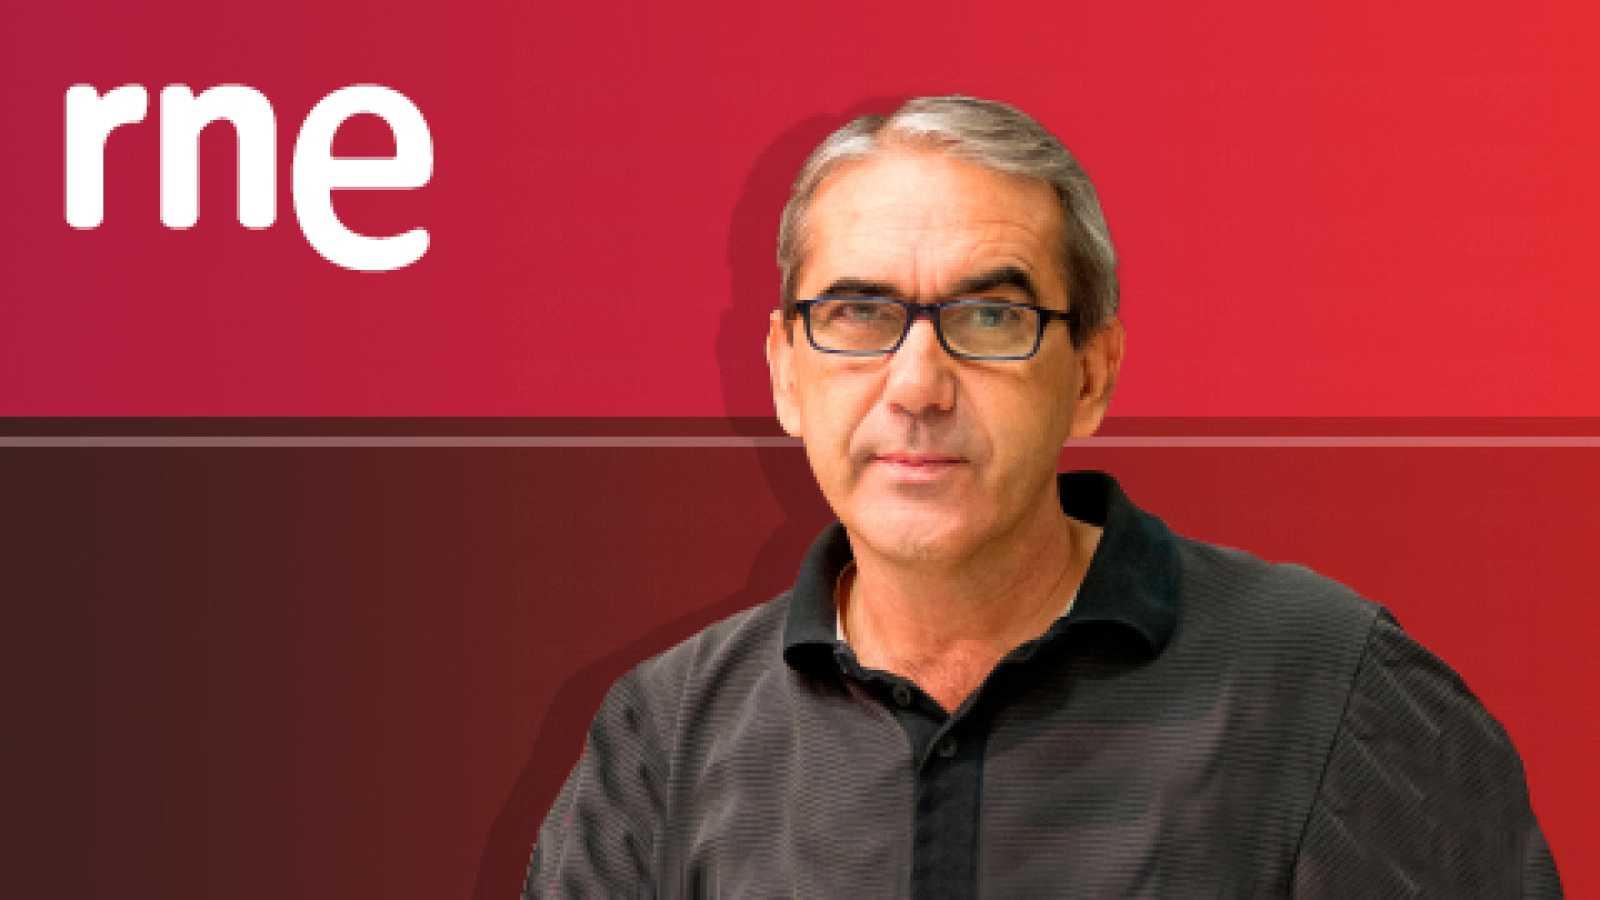 Historias de papel - 20/09/20 - Rosa Montero, Vicente Valero, Mario Benedetti